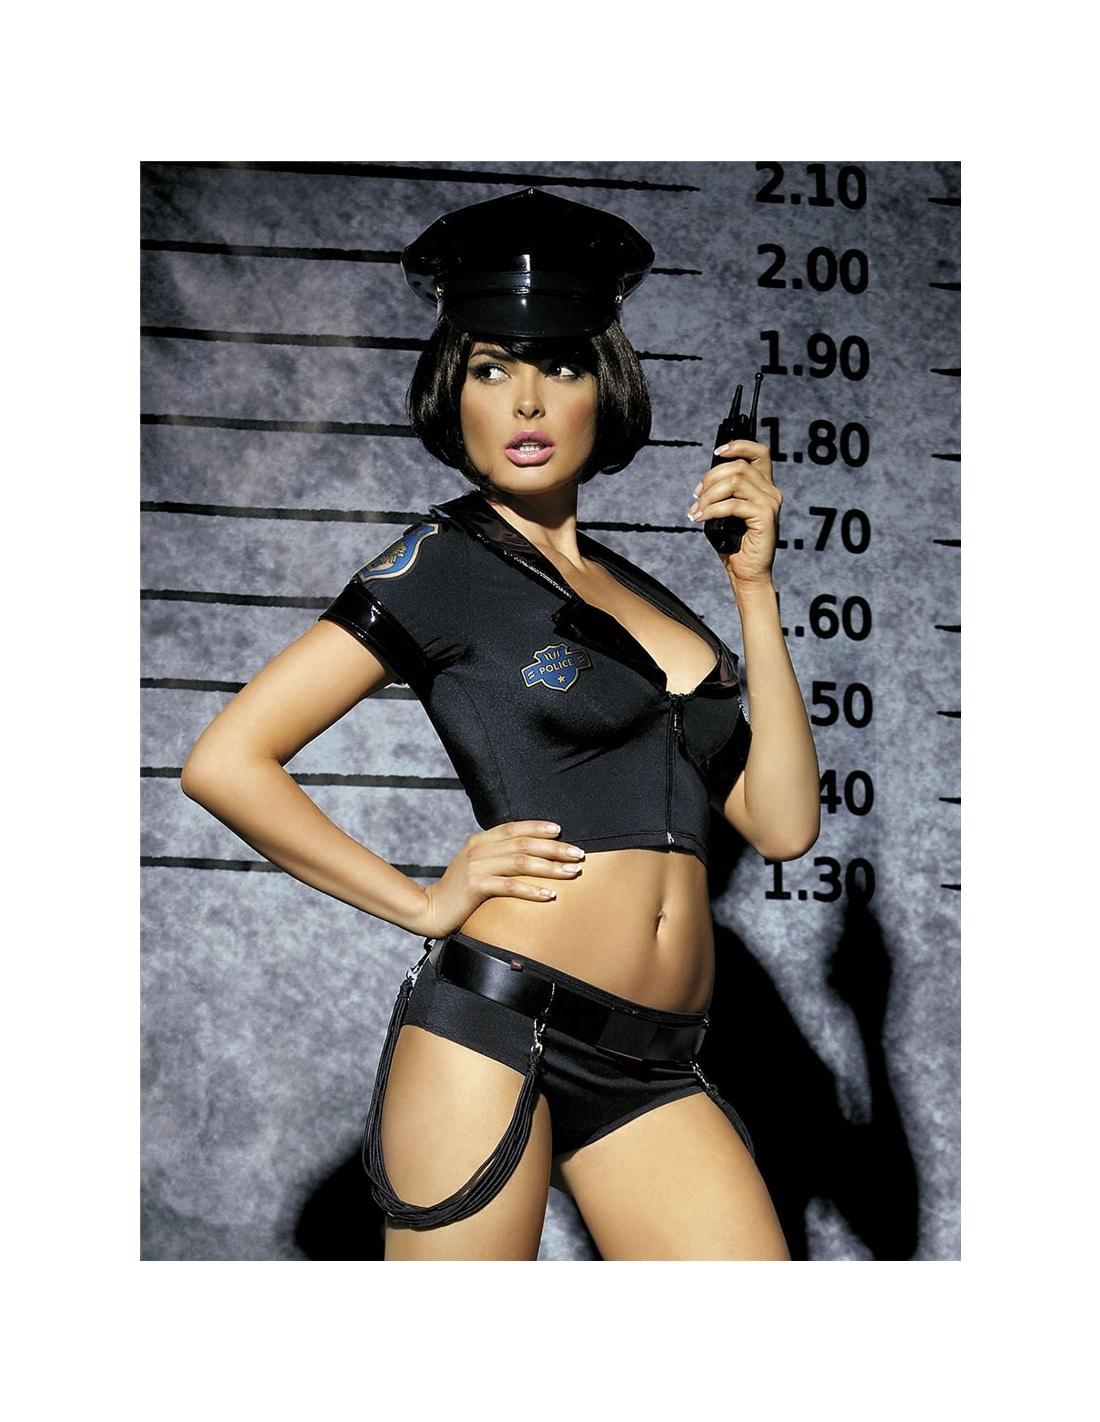 Fantasia Polícia Obsessive - 36-38 S/M - PAOB0922